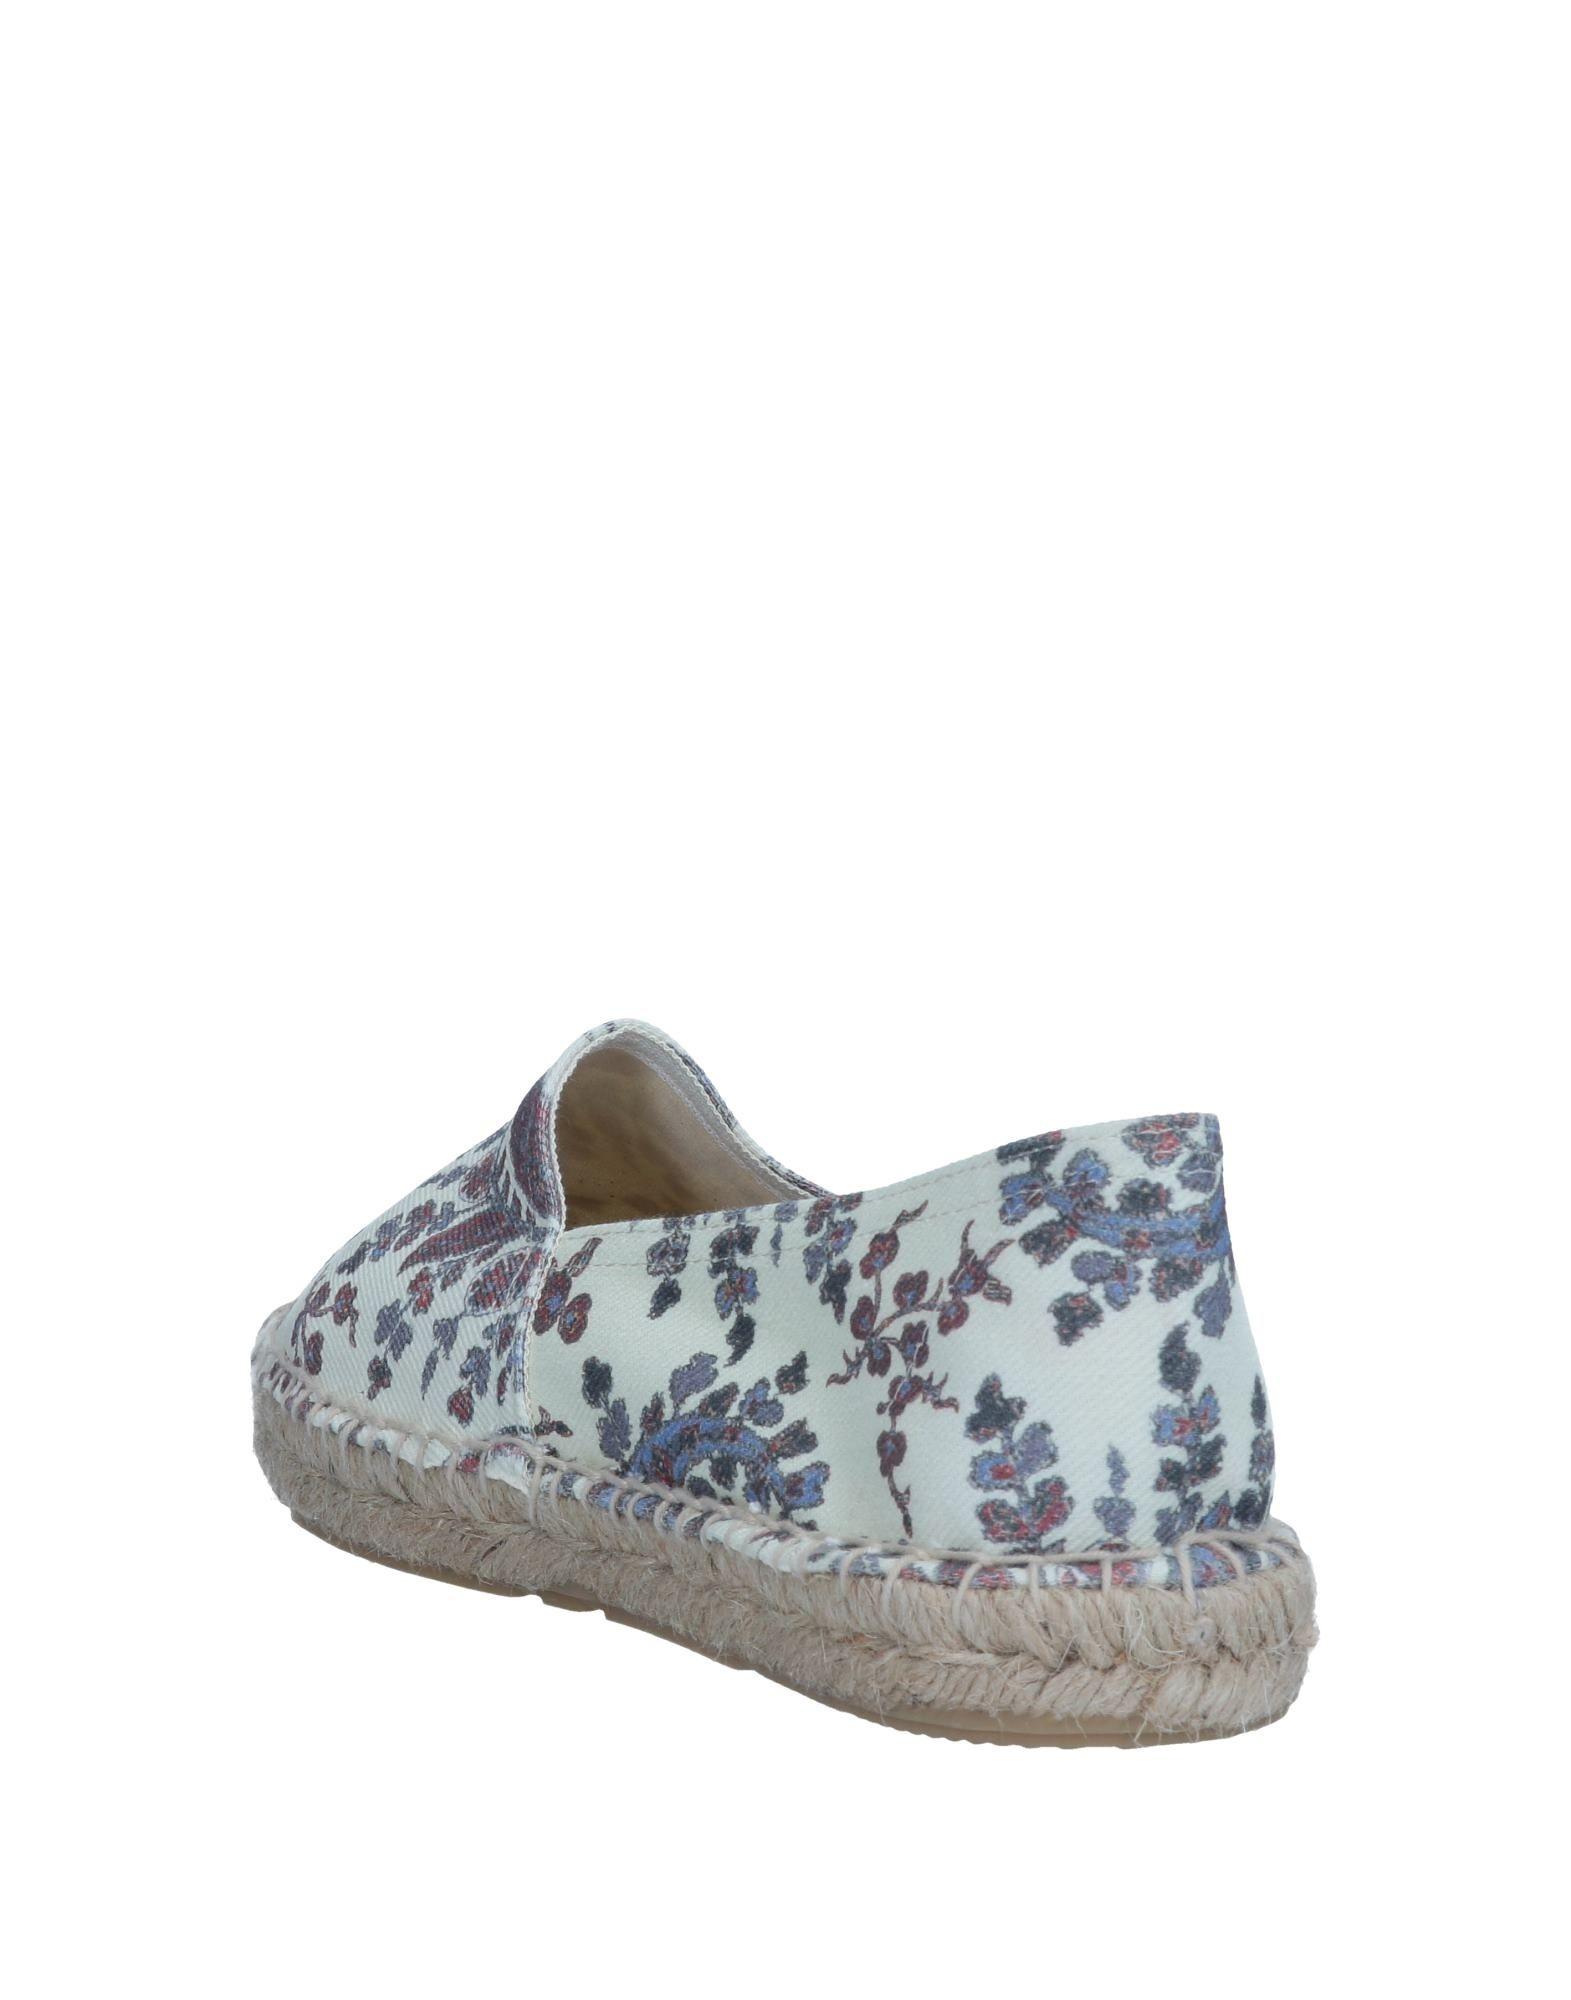 Stilvolle Marant billige Schuhe Isabel Marant Stilvolle Étoile Espadrilles Damen  11543713VV 8ecdfe